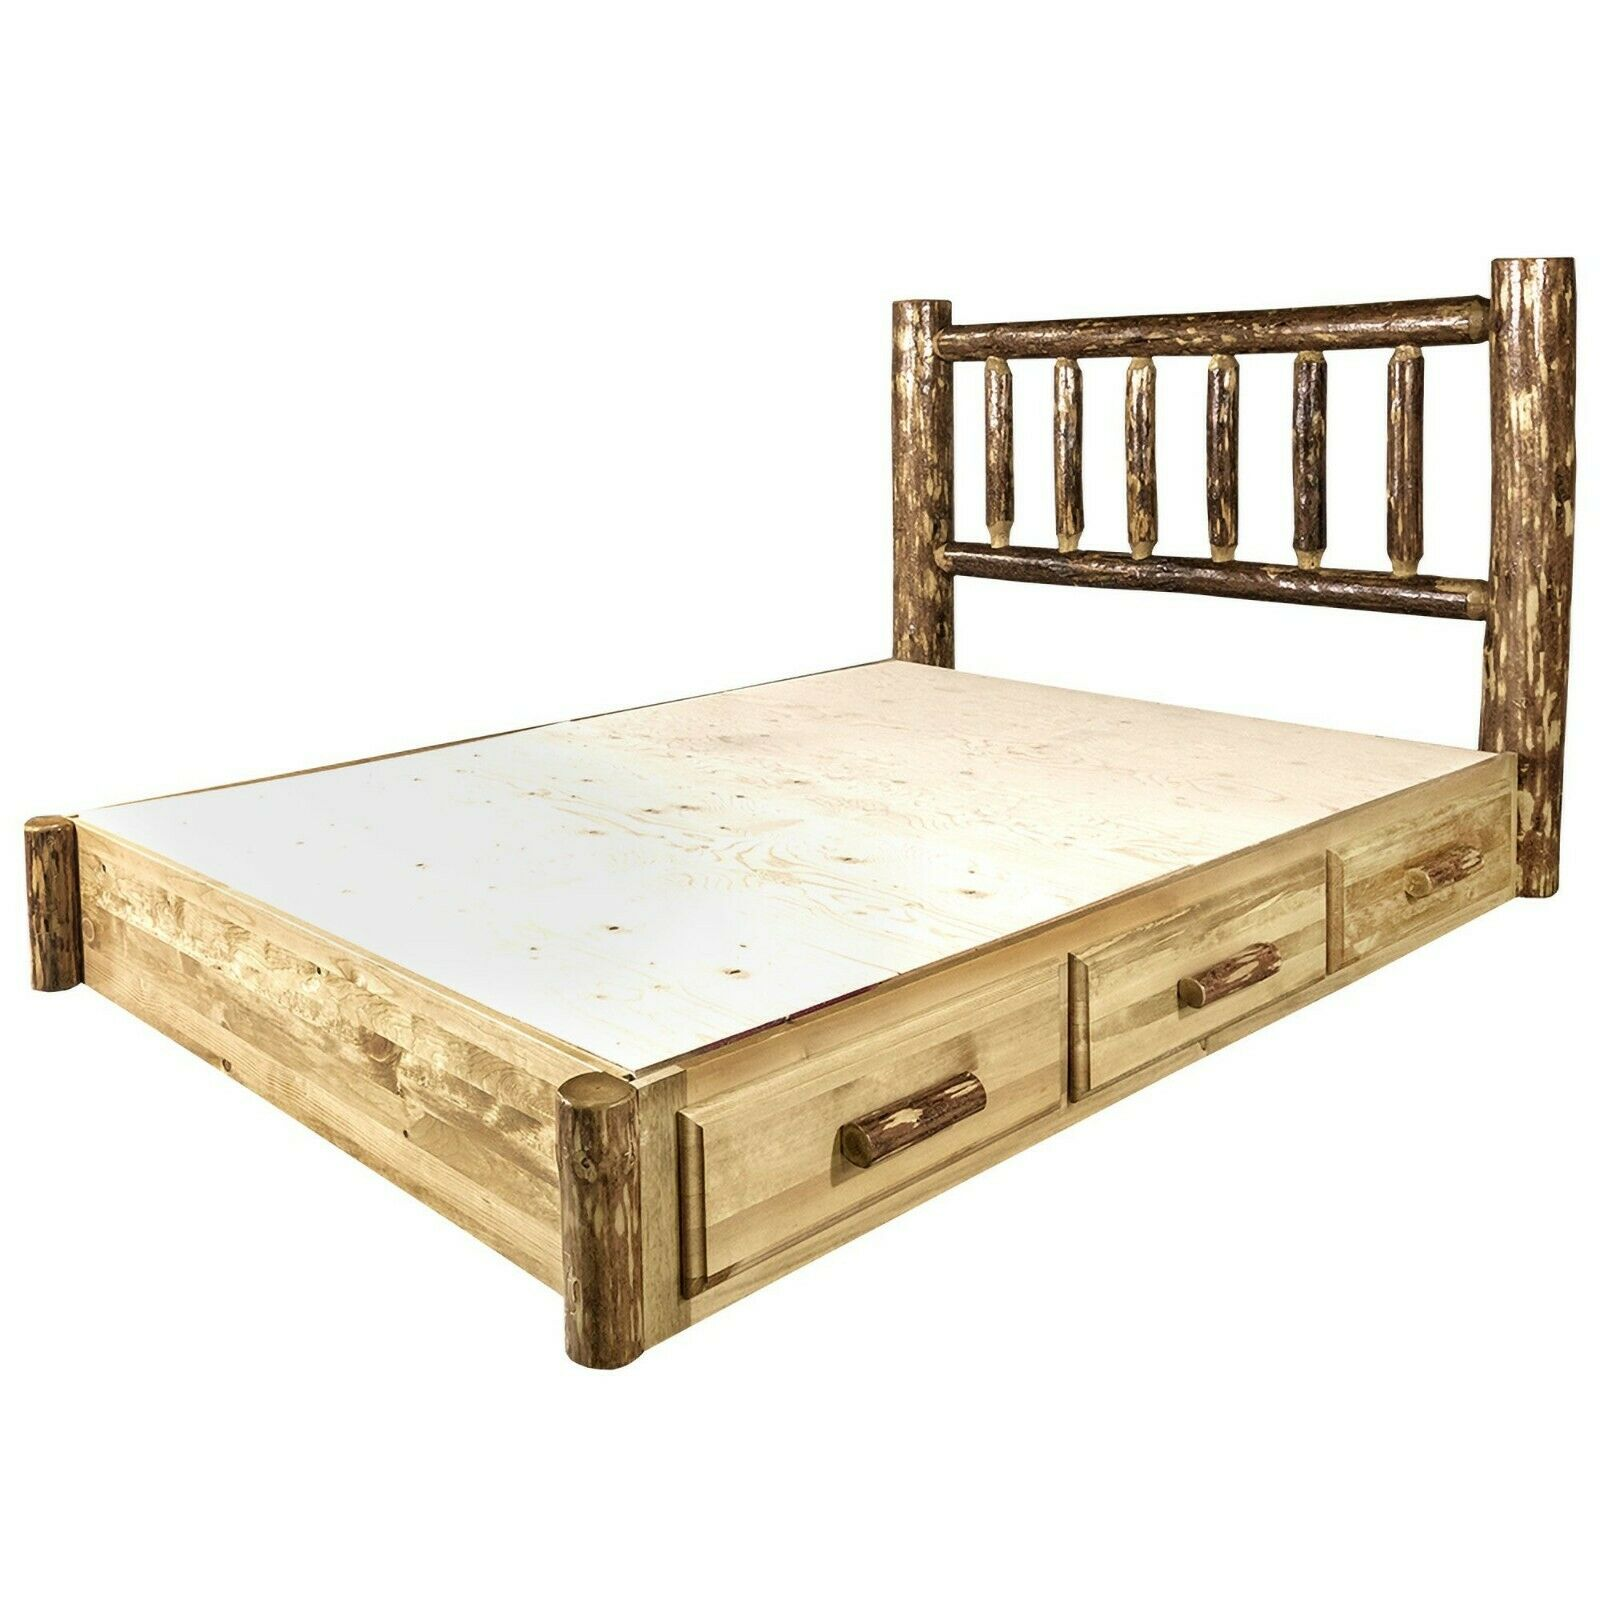 Amish Rustic Pine King Unfinished Captain S Storage Platform Bed 4 Drawers For Sale Online Ebay